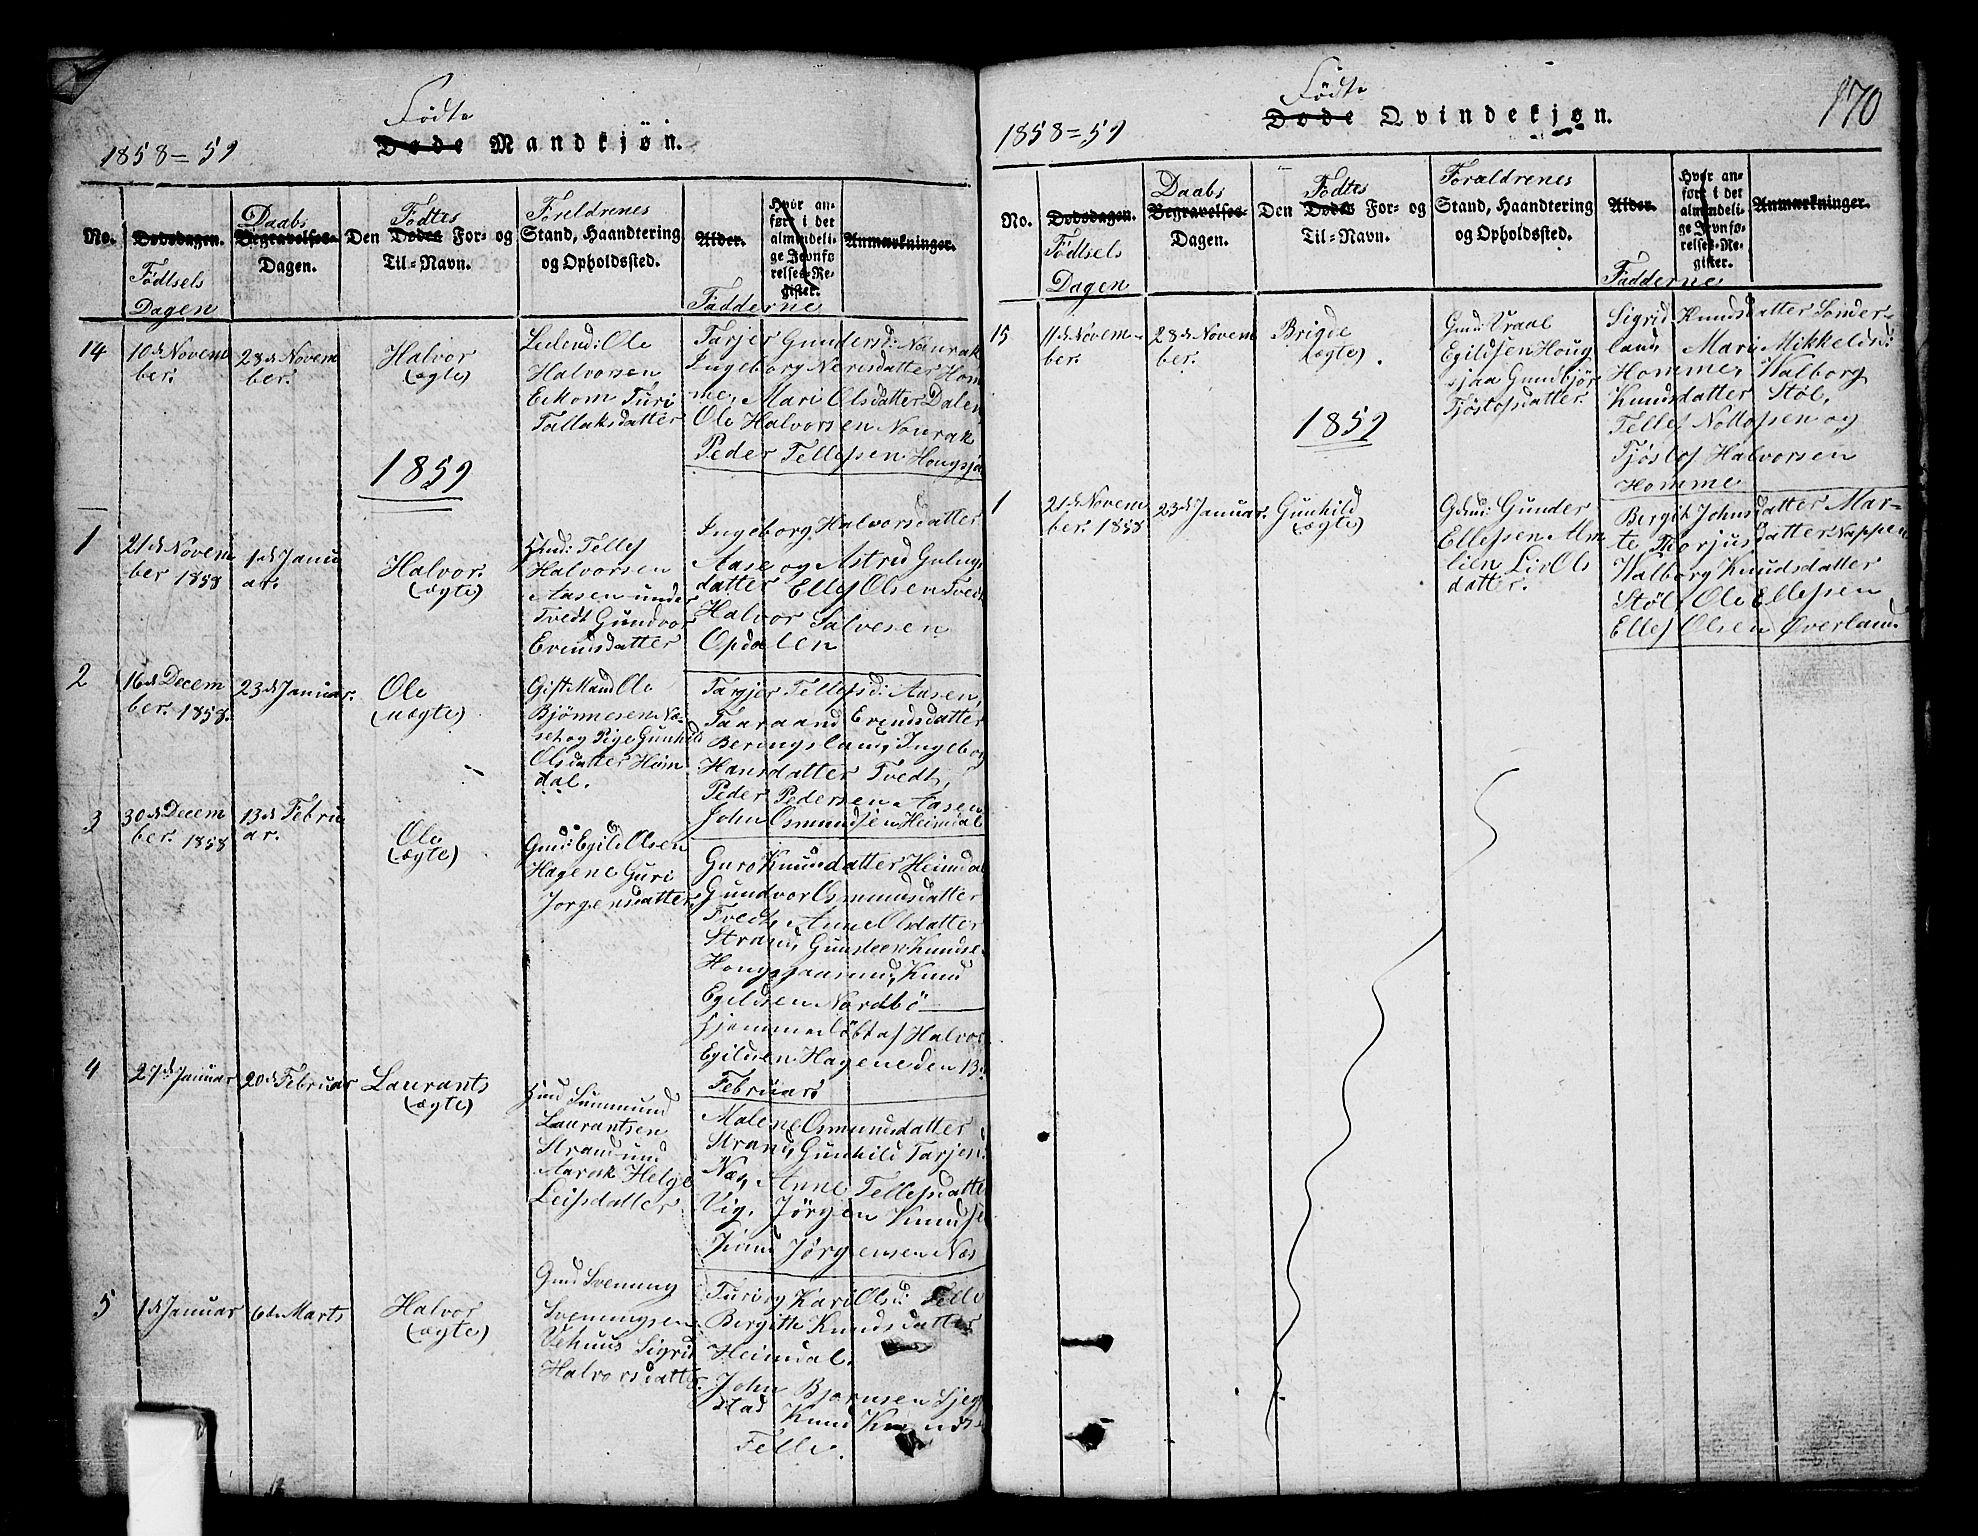 SAKO, Nissedal kirkebøker, G/Gb/L0001: Klokkerbok nr. II 1, 1814-1862, s. 170